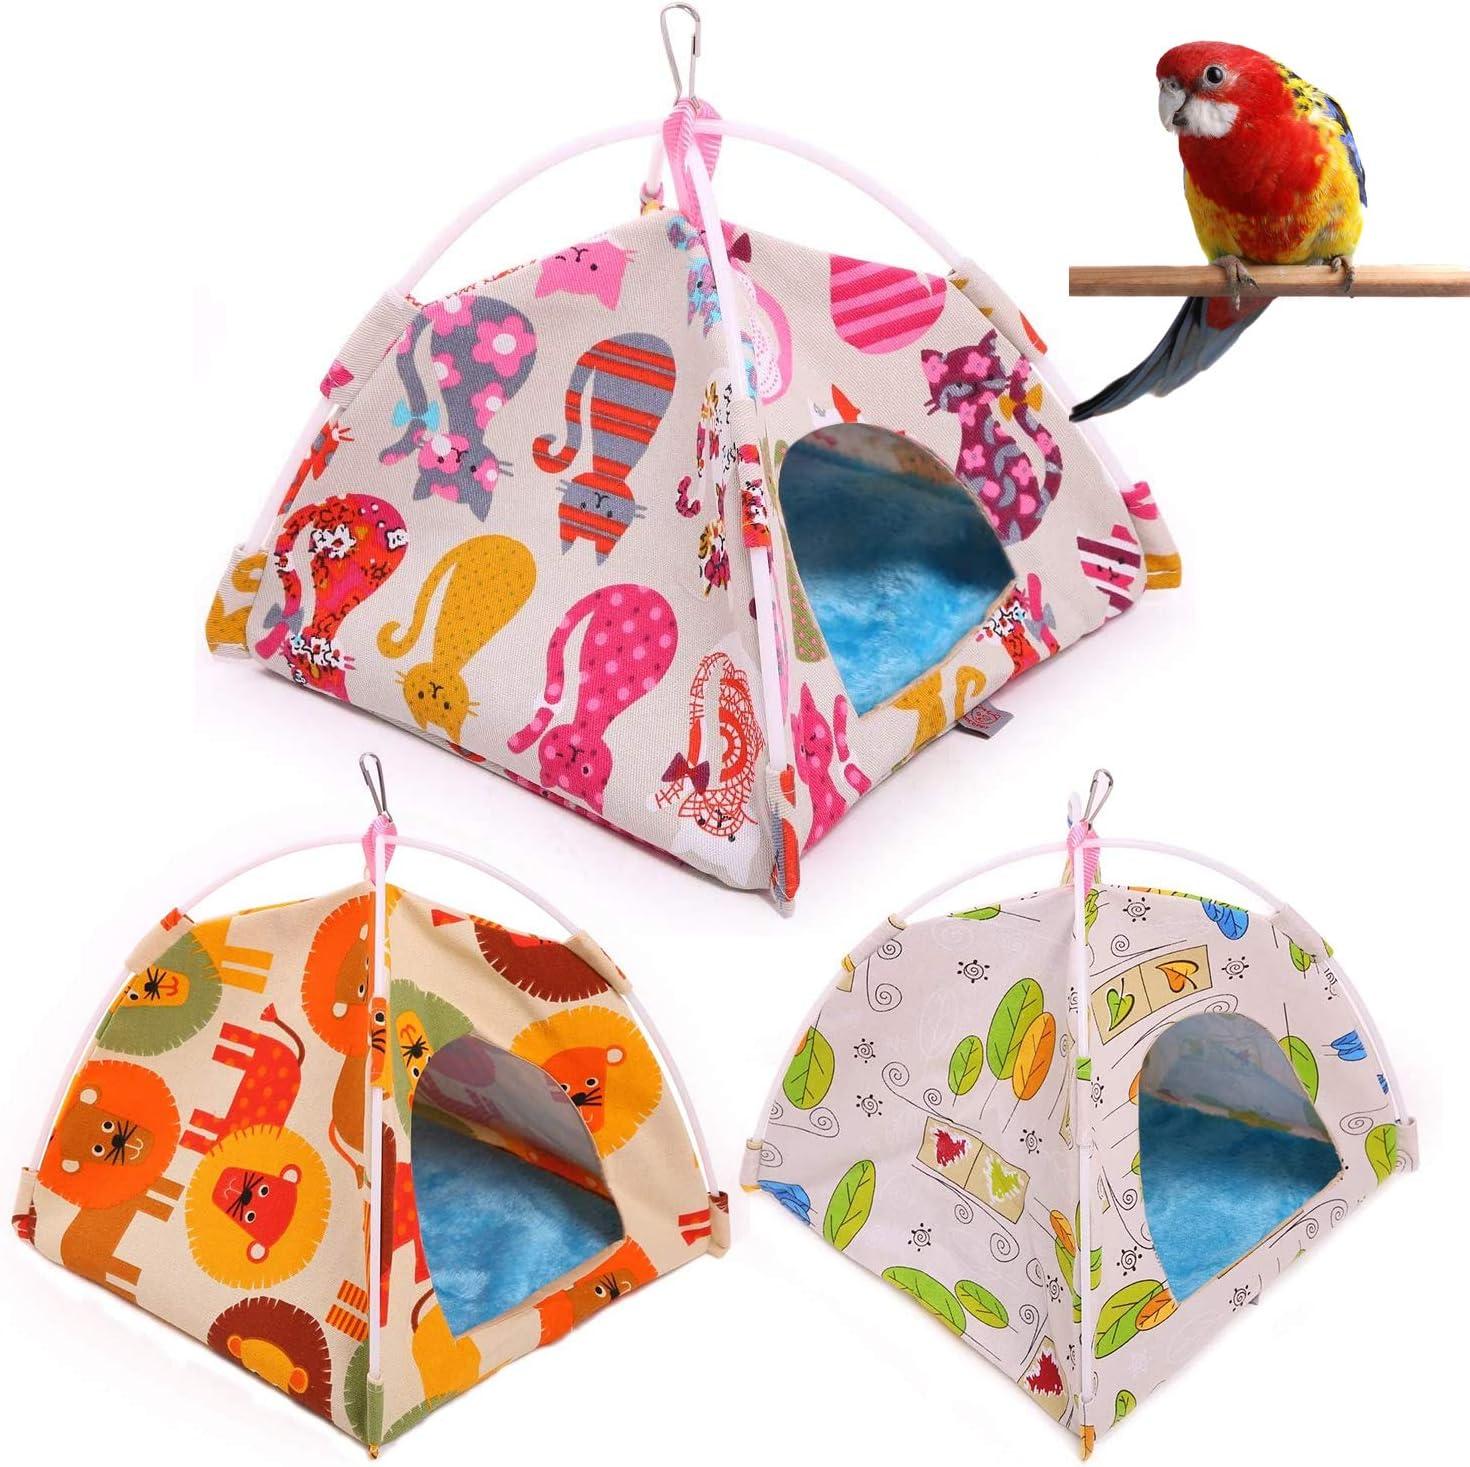 Bird Nest Hut Our shop OFFers the best service Hammock—Bird Bed House Tent Parrot Limited price sale Habita